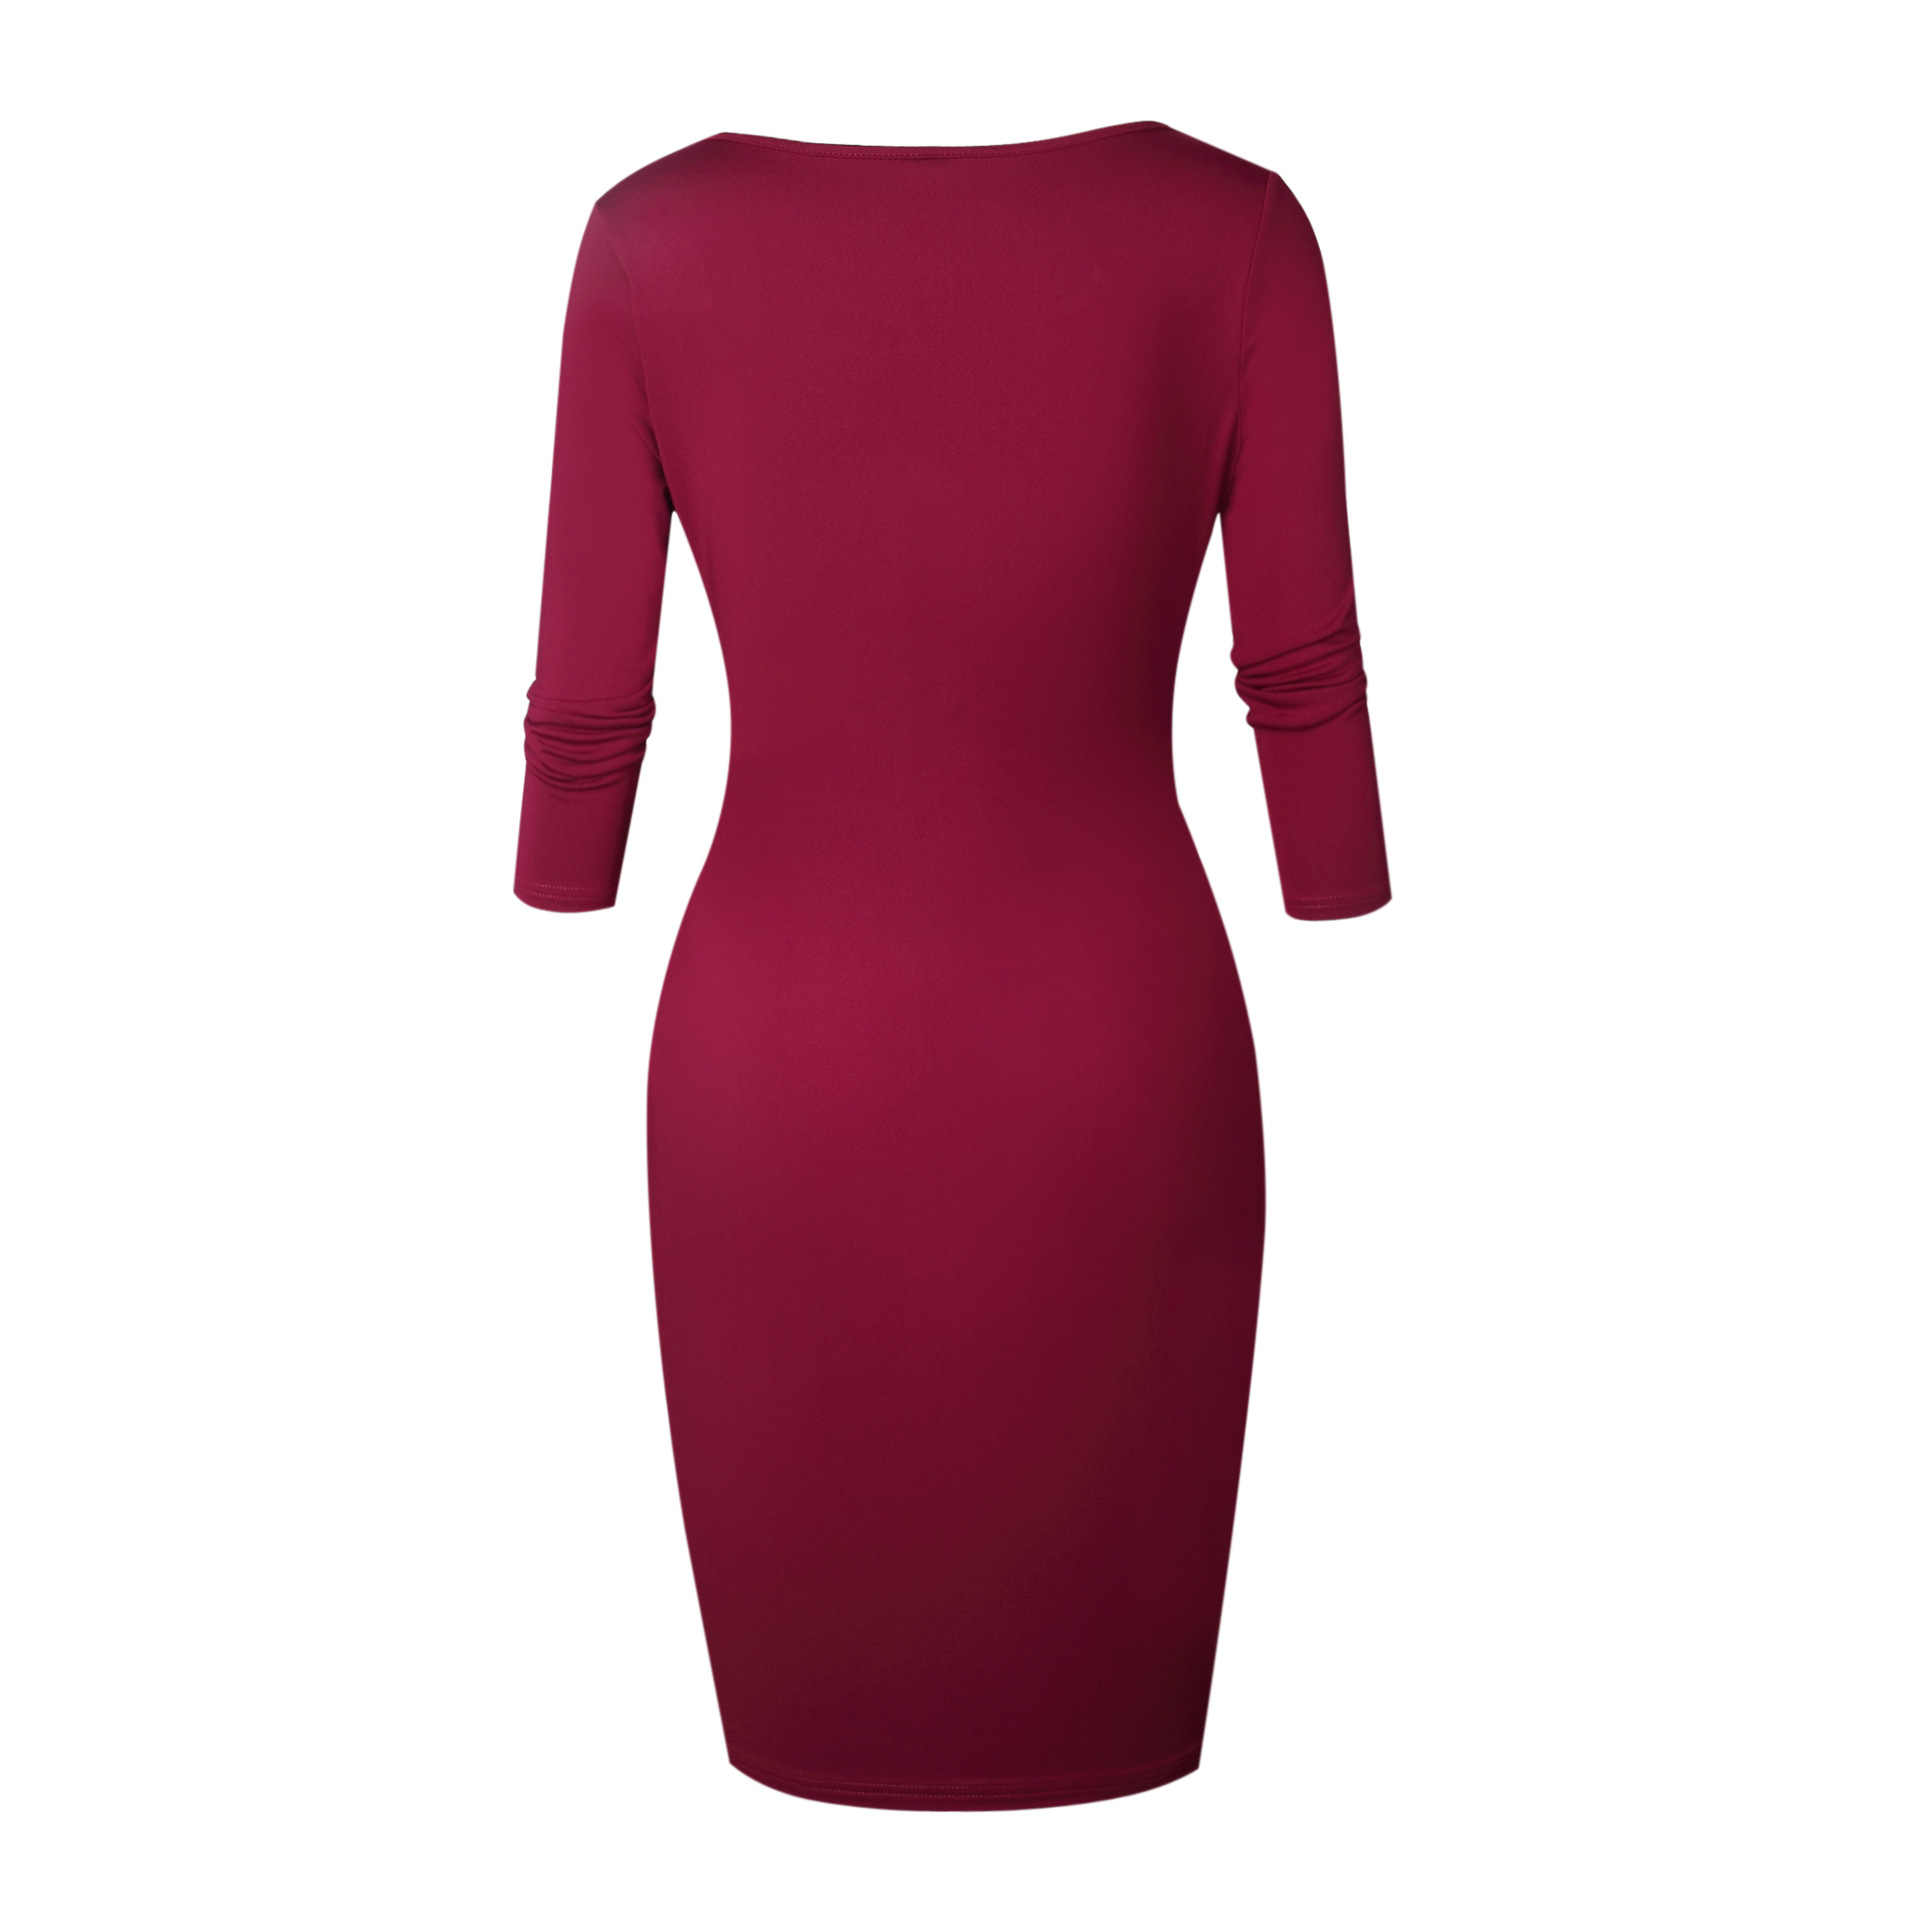 Women Sexy Club Low Cut Bodycon Dress Red Velvet Sheath  Zipper Pack Hip Wear Party Dresses Black Vestidos